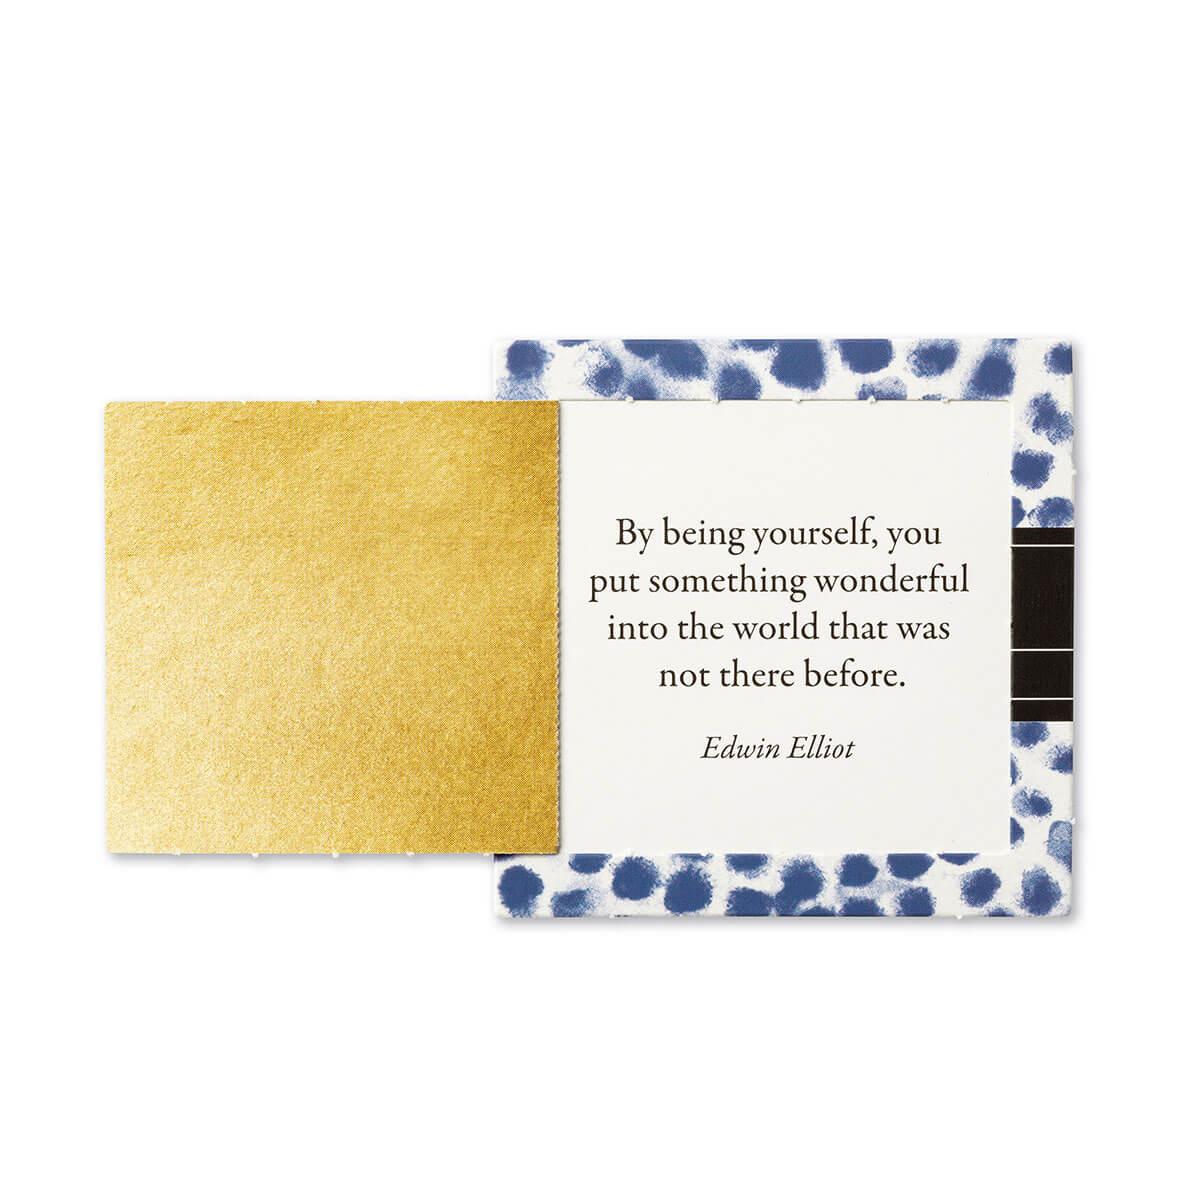 Thoughtfulls You Matter Cards - box